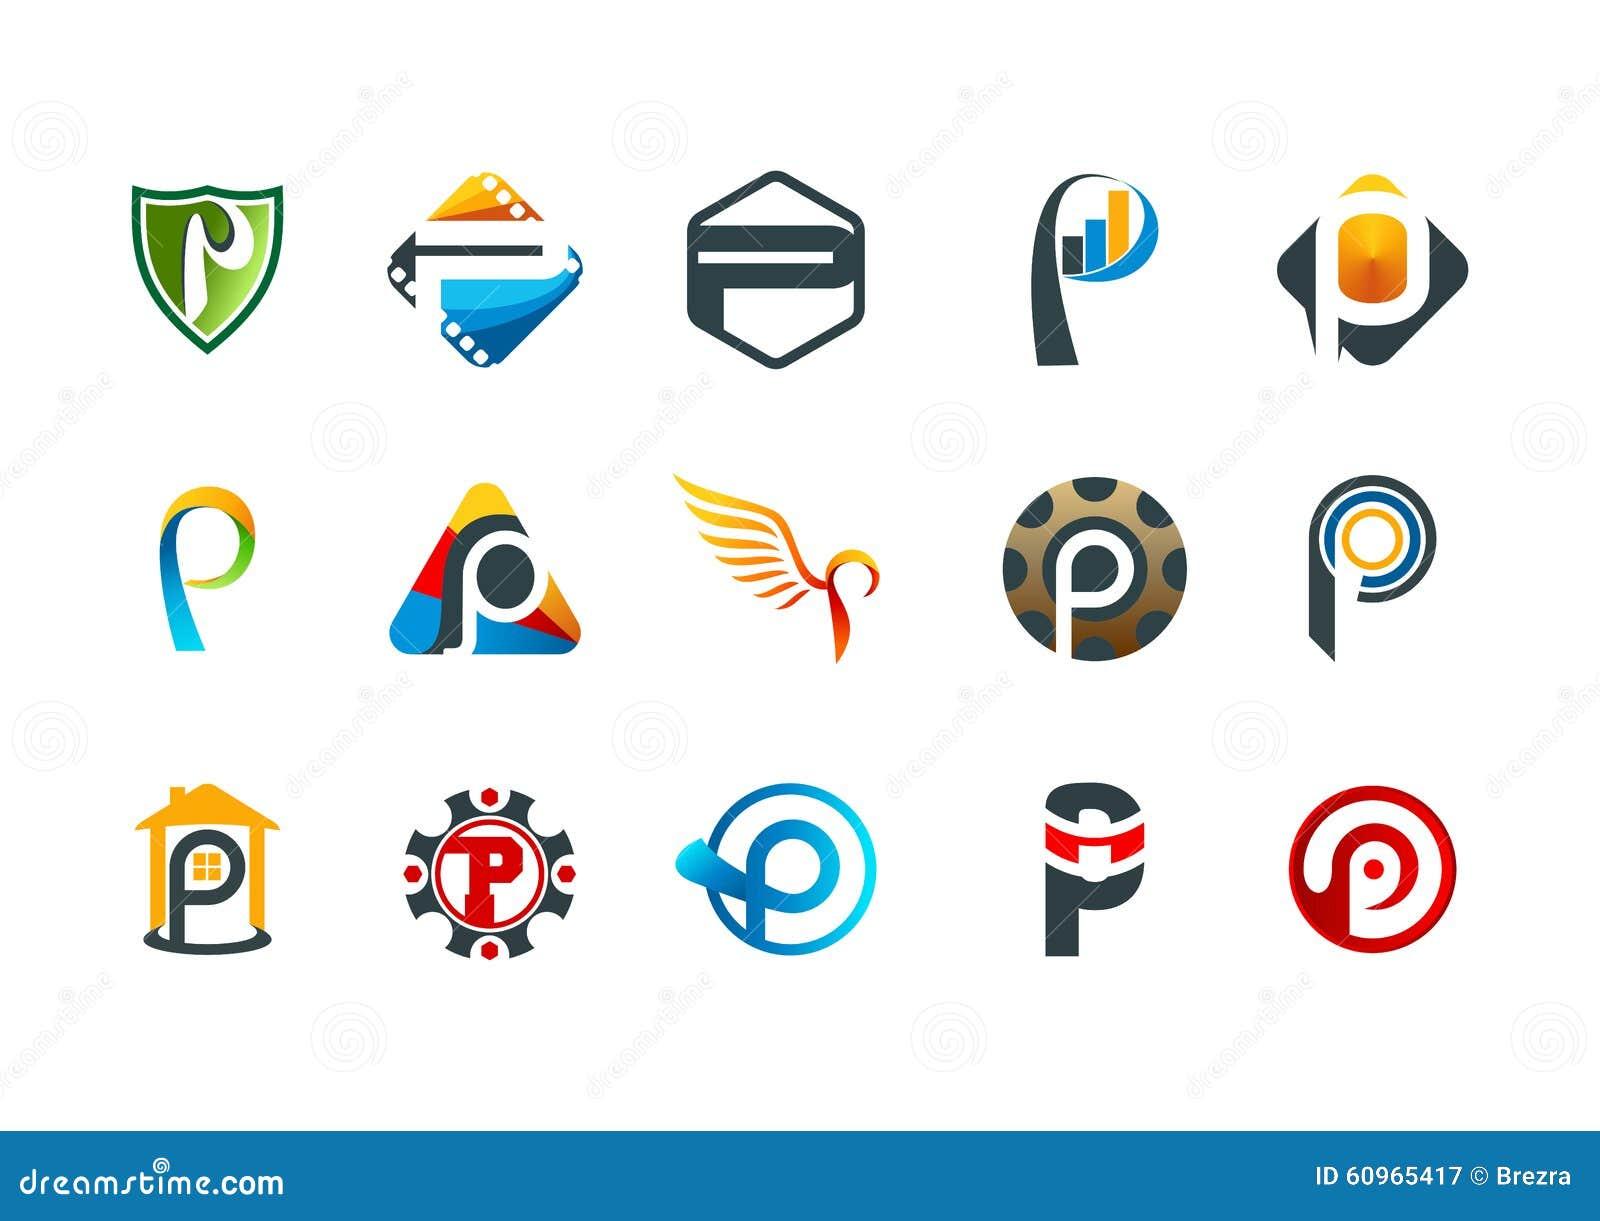 Letter P Logo, Modern Business Corporate Symbol Design Stock Vector ...